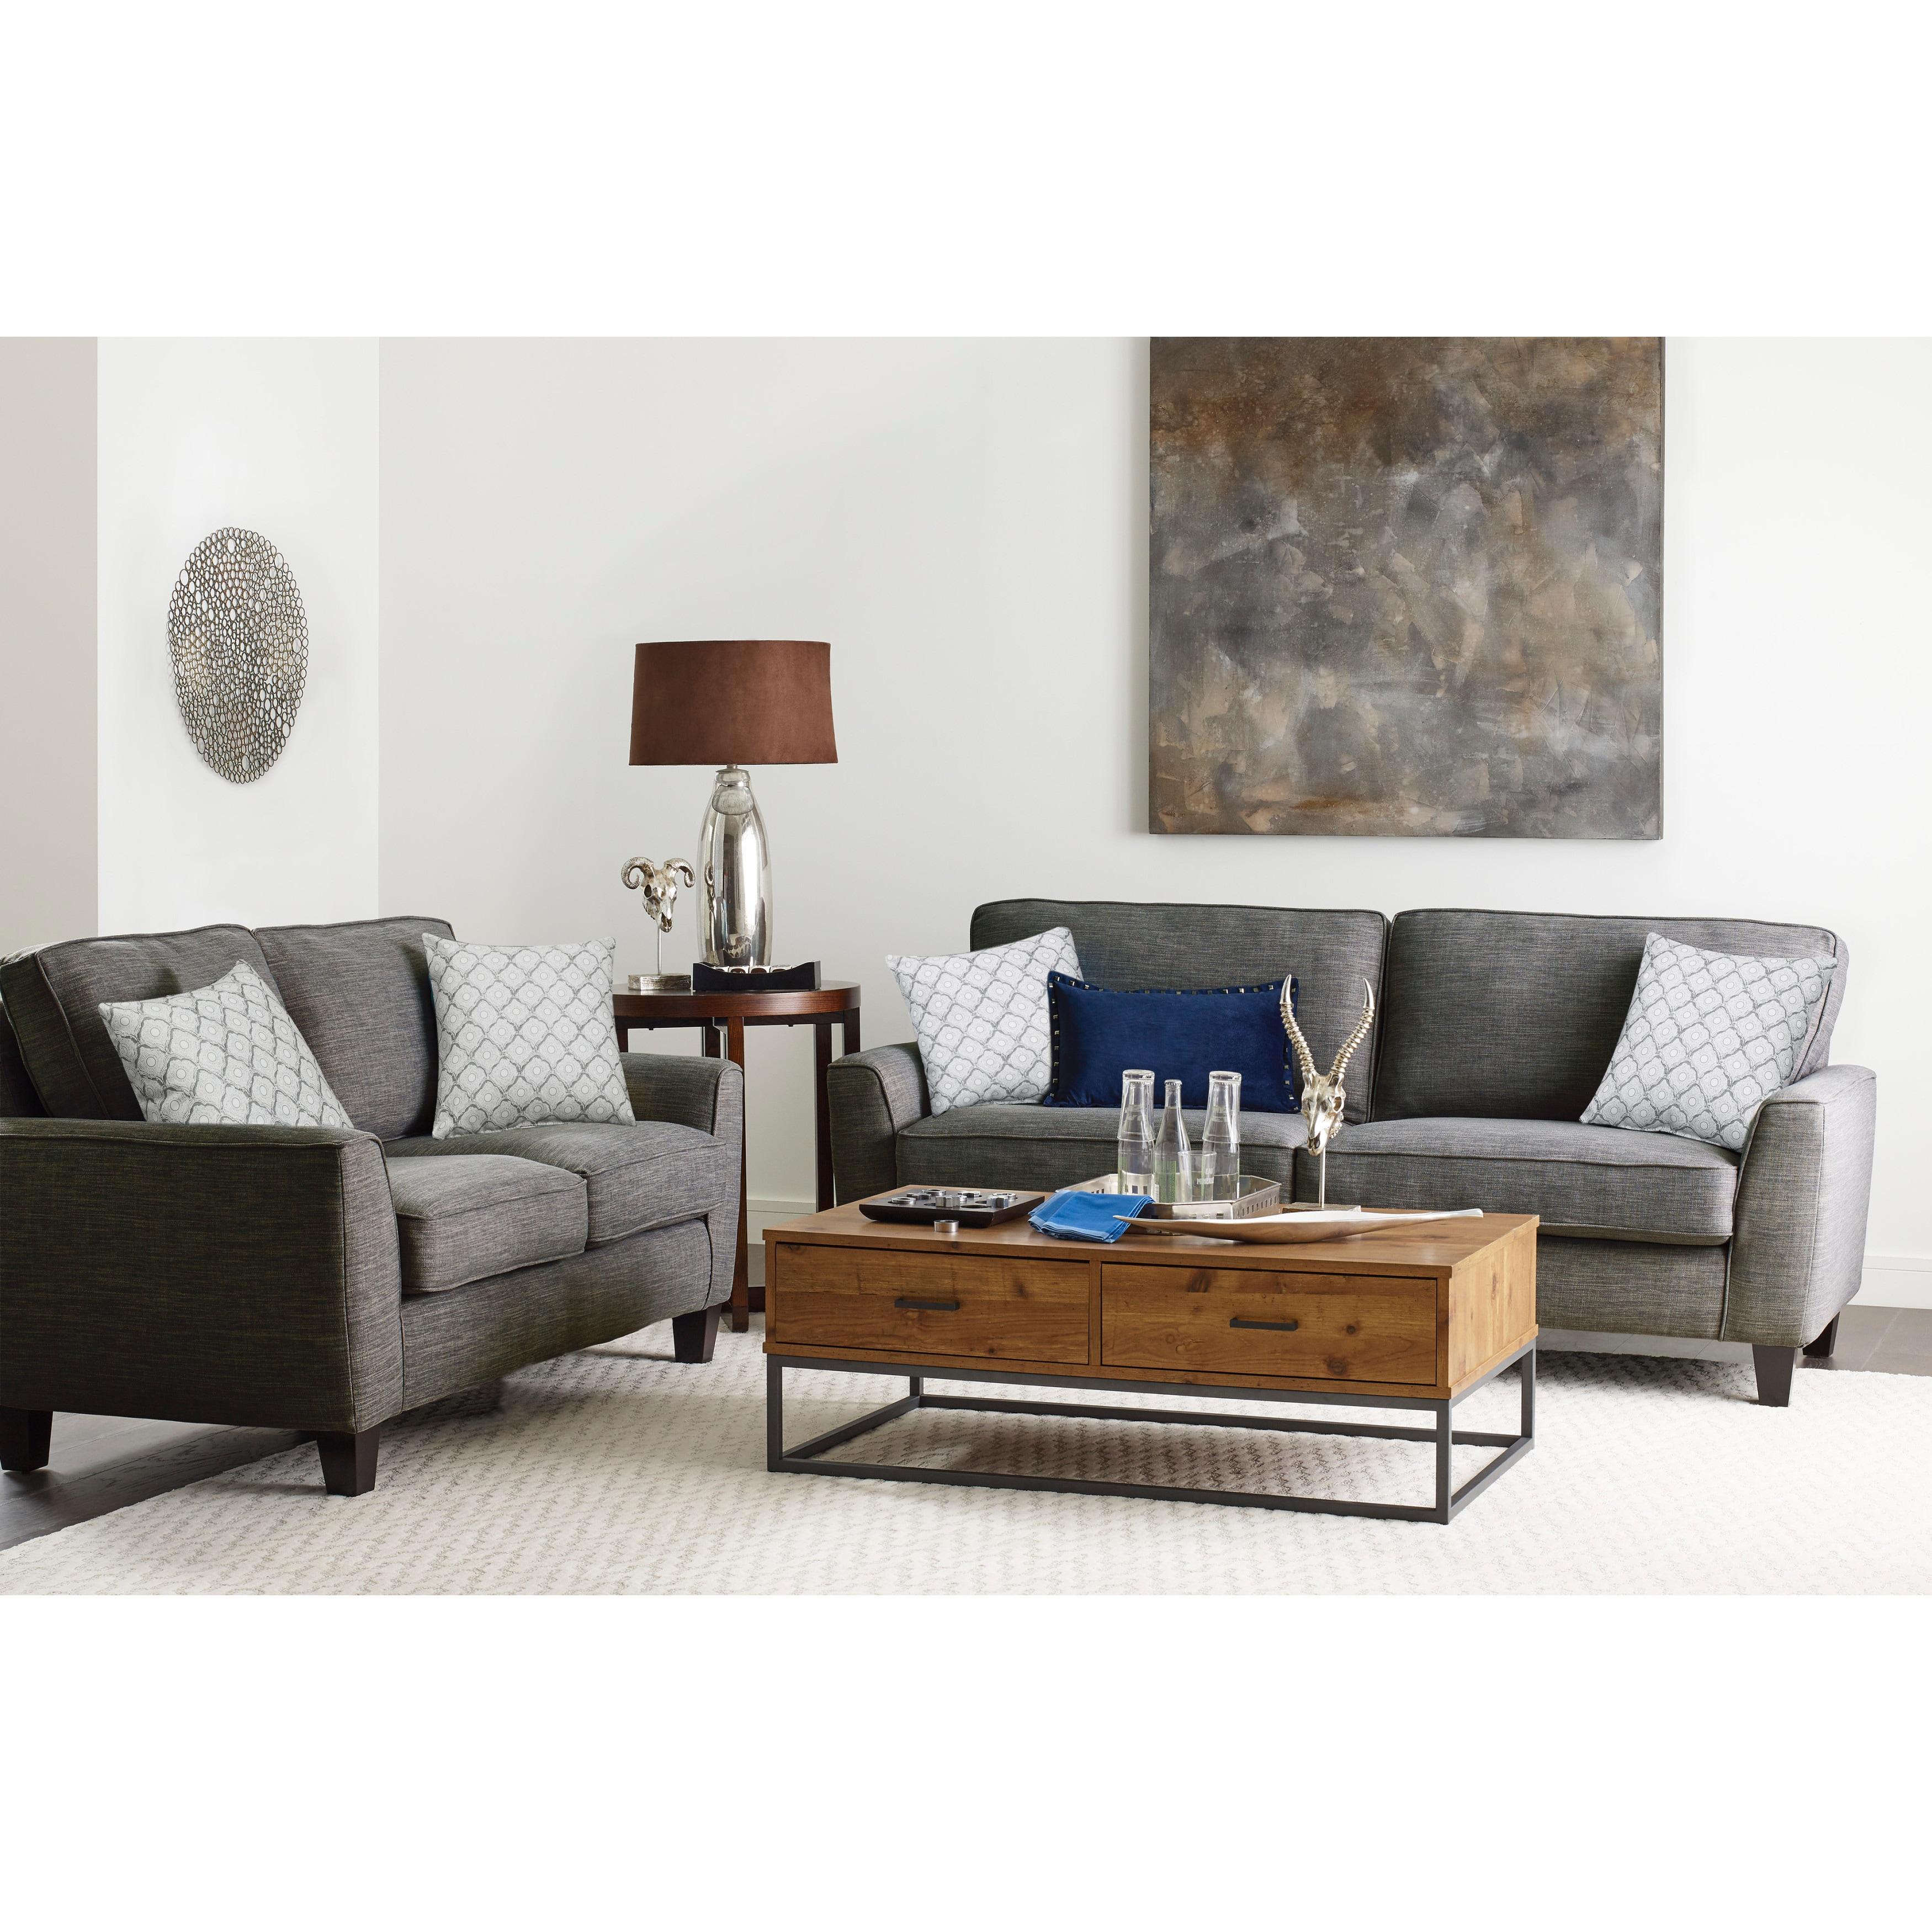 Shop Serta Astoria Deep Seating 78-inch Sofa - Free Shipping Today ...